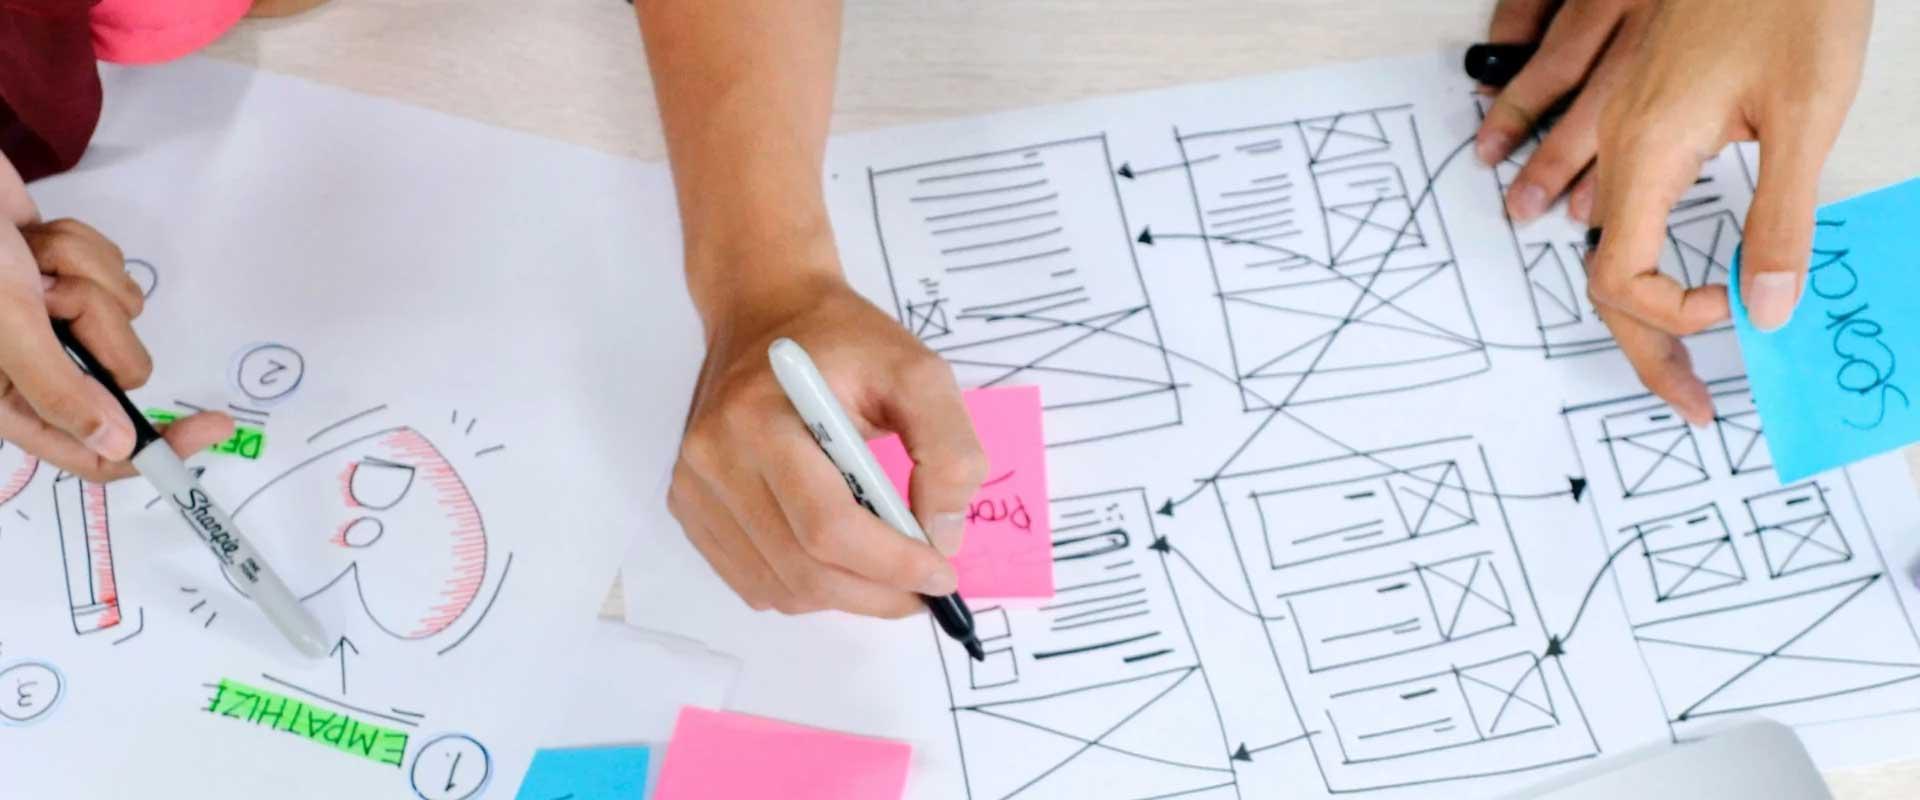 webdesign-seo-nuernberg